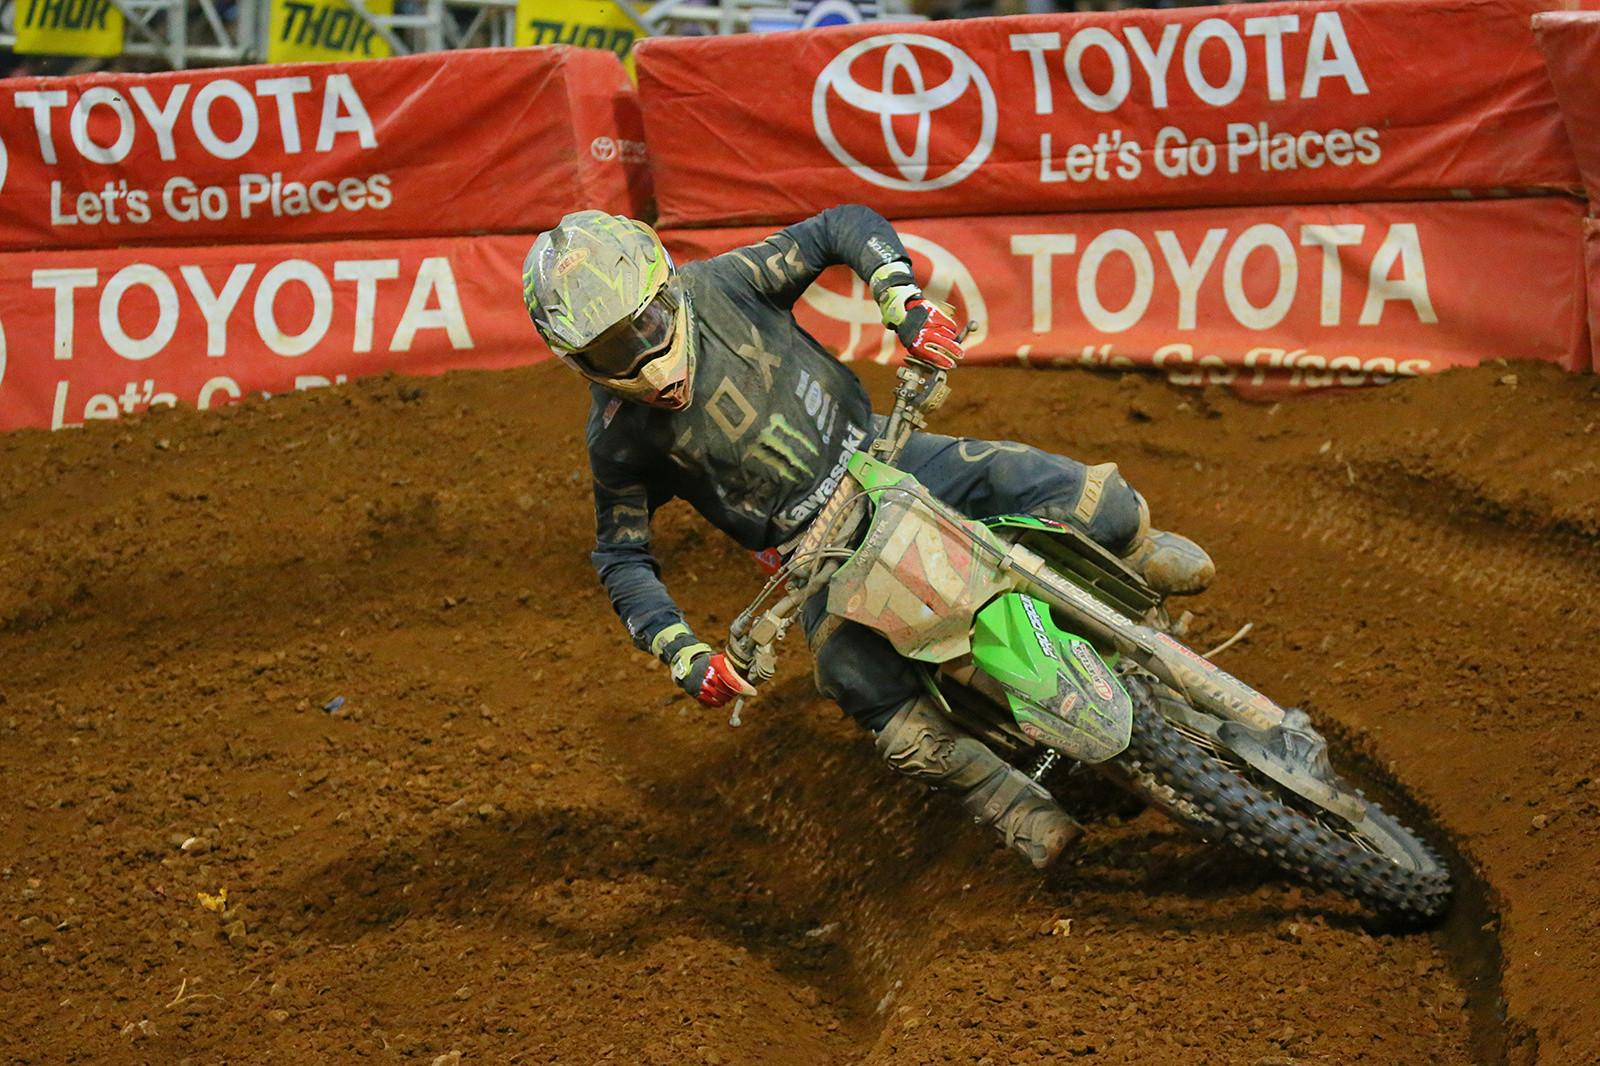 Joey Savatgy - Photo Blast: Atlanta Supercross - Motocross Pictures - Vital MX